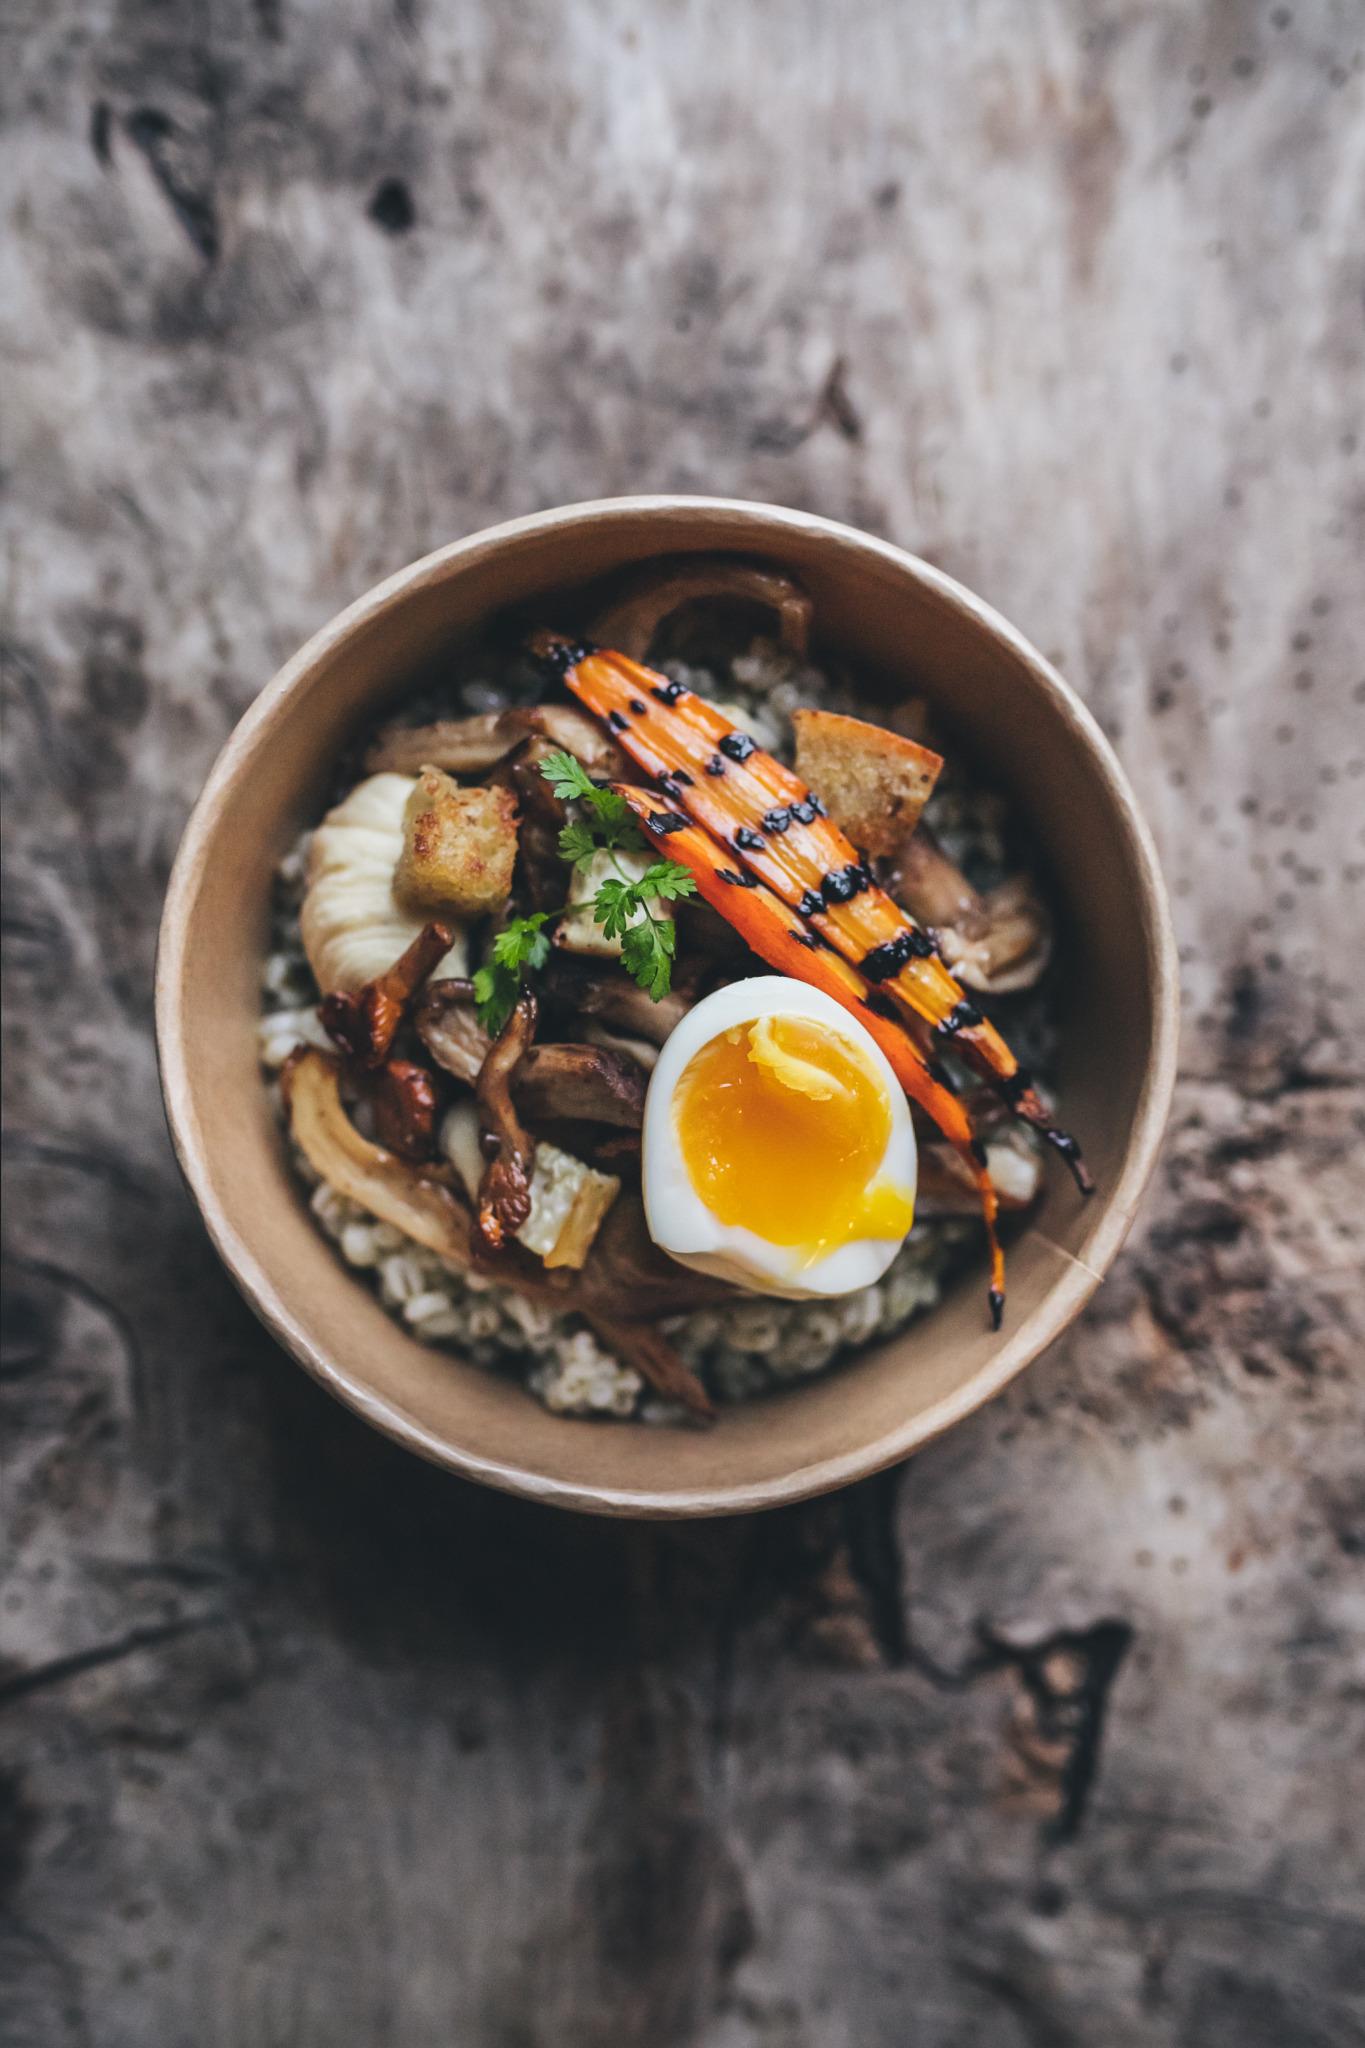 gepocheerd ei met groente en humus